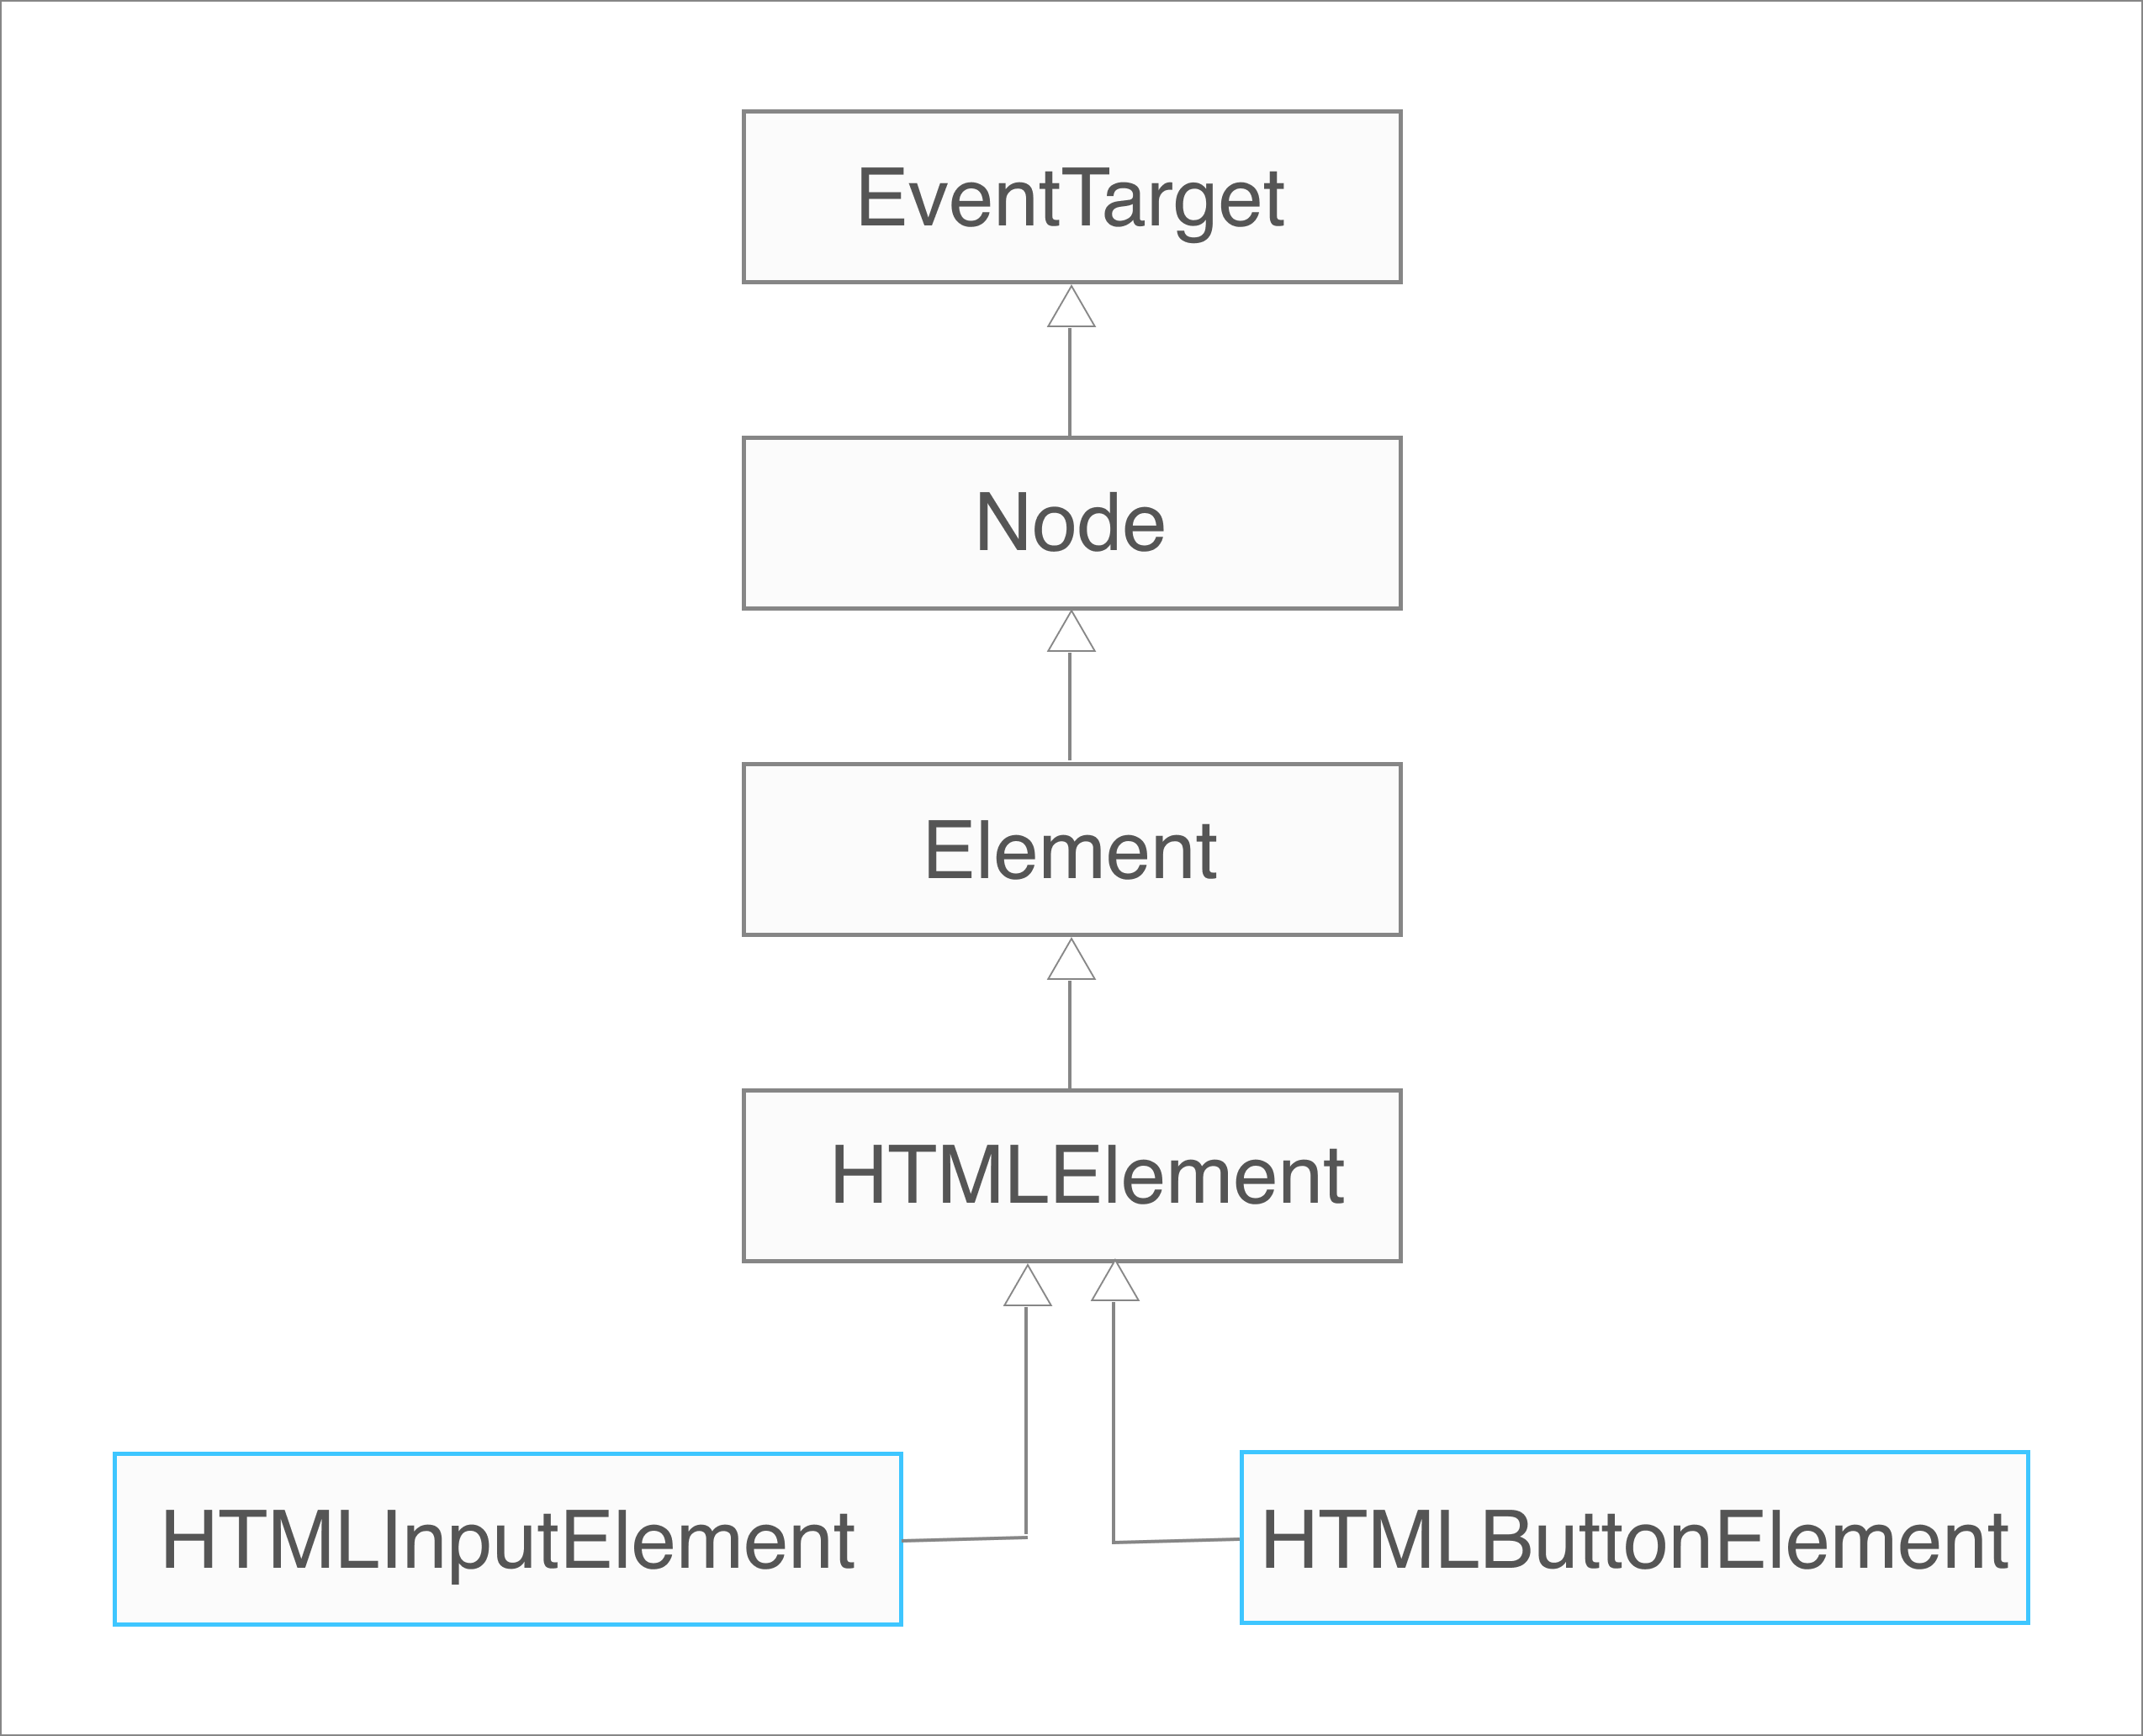 html-input-element html-button-element